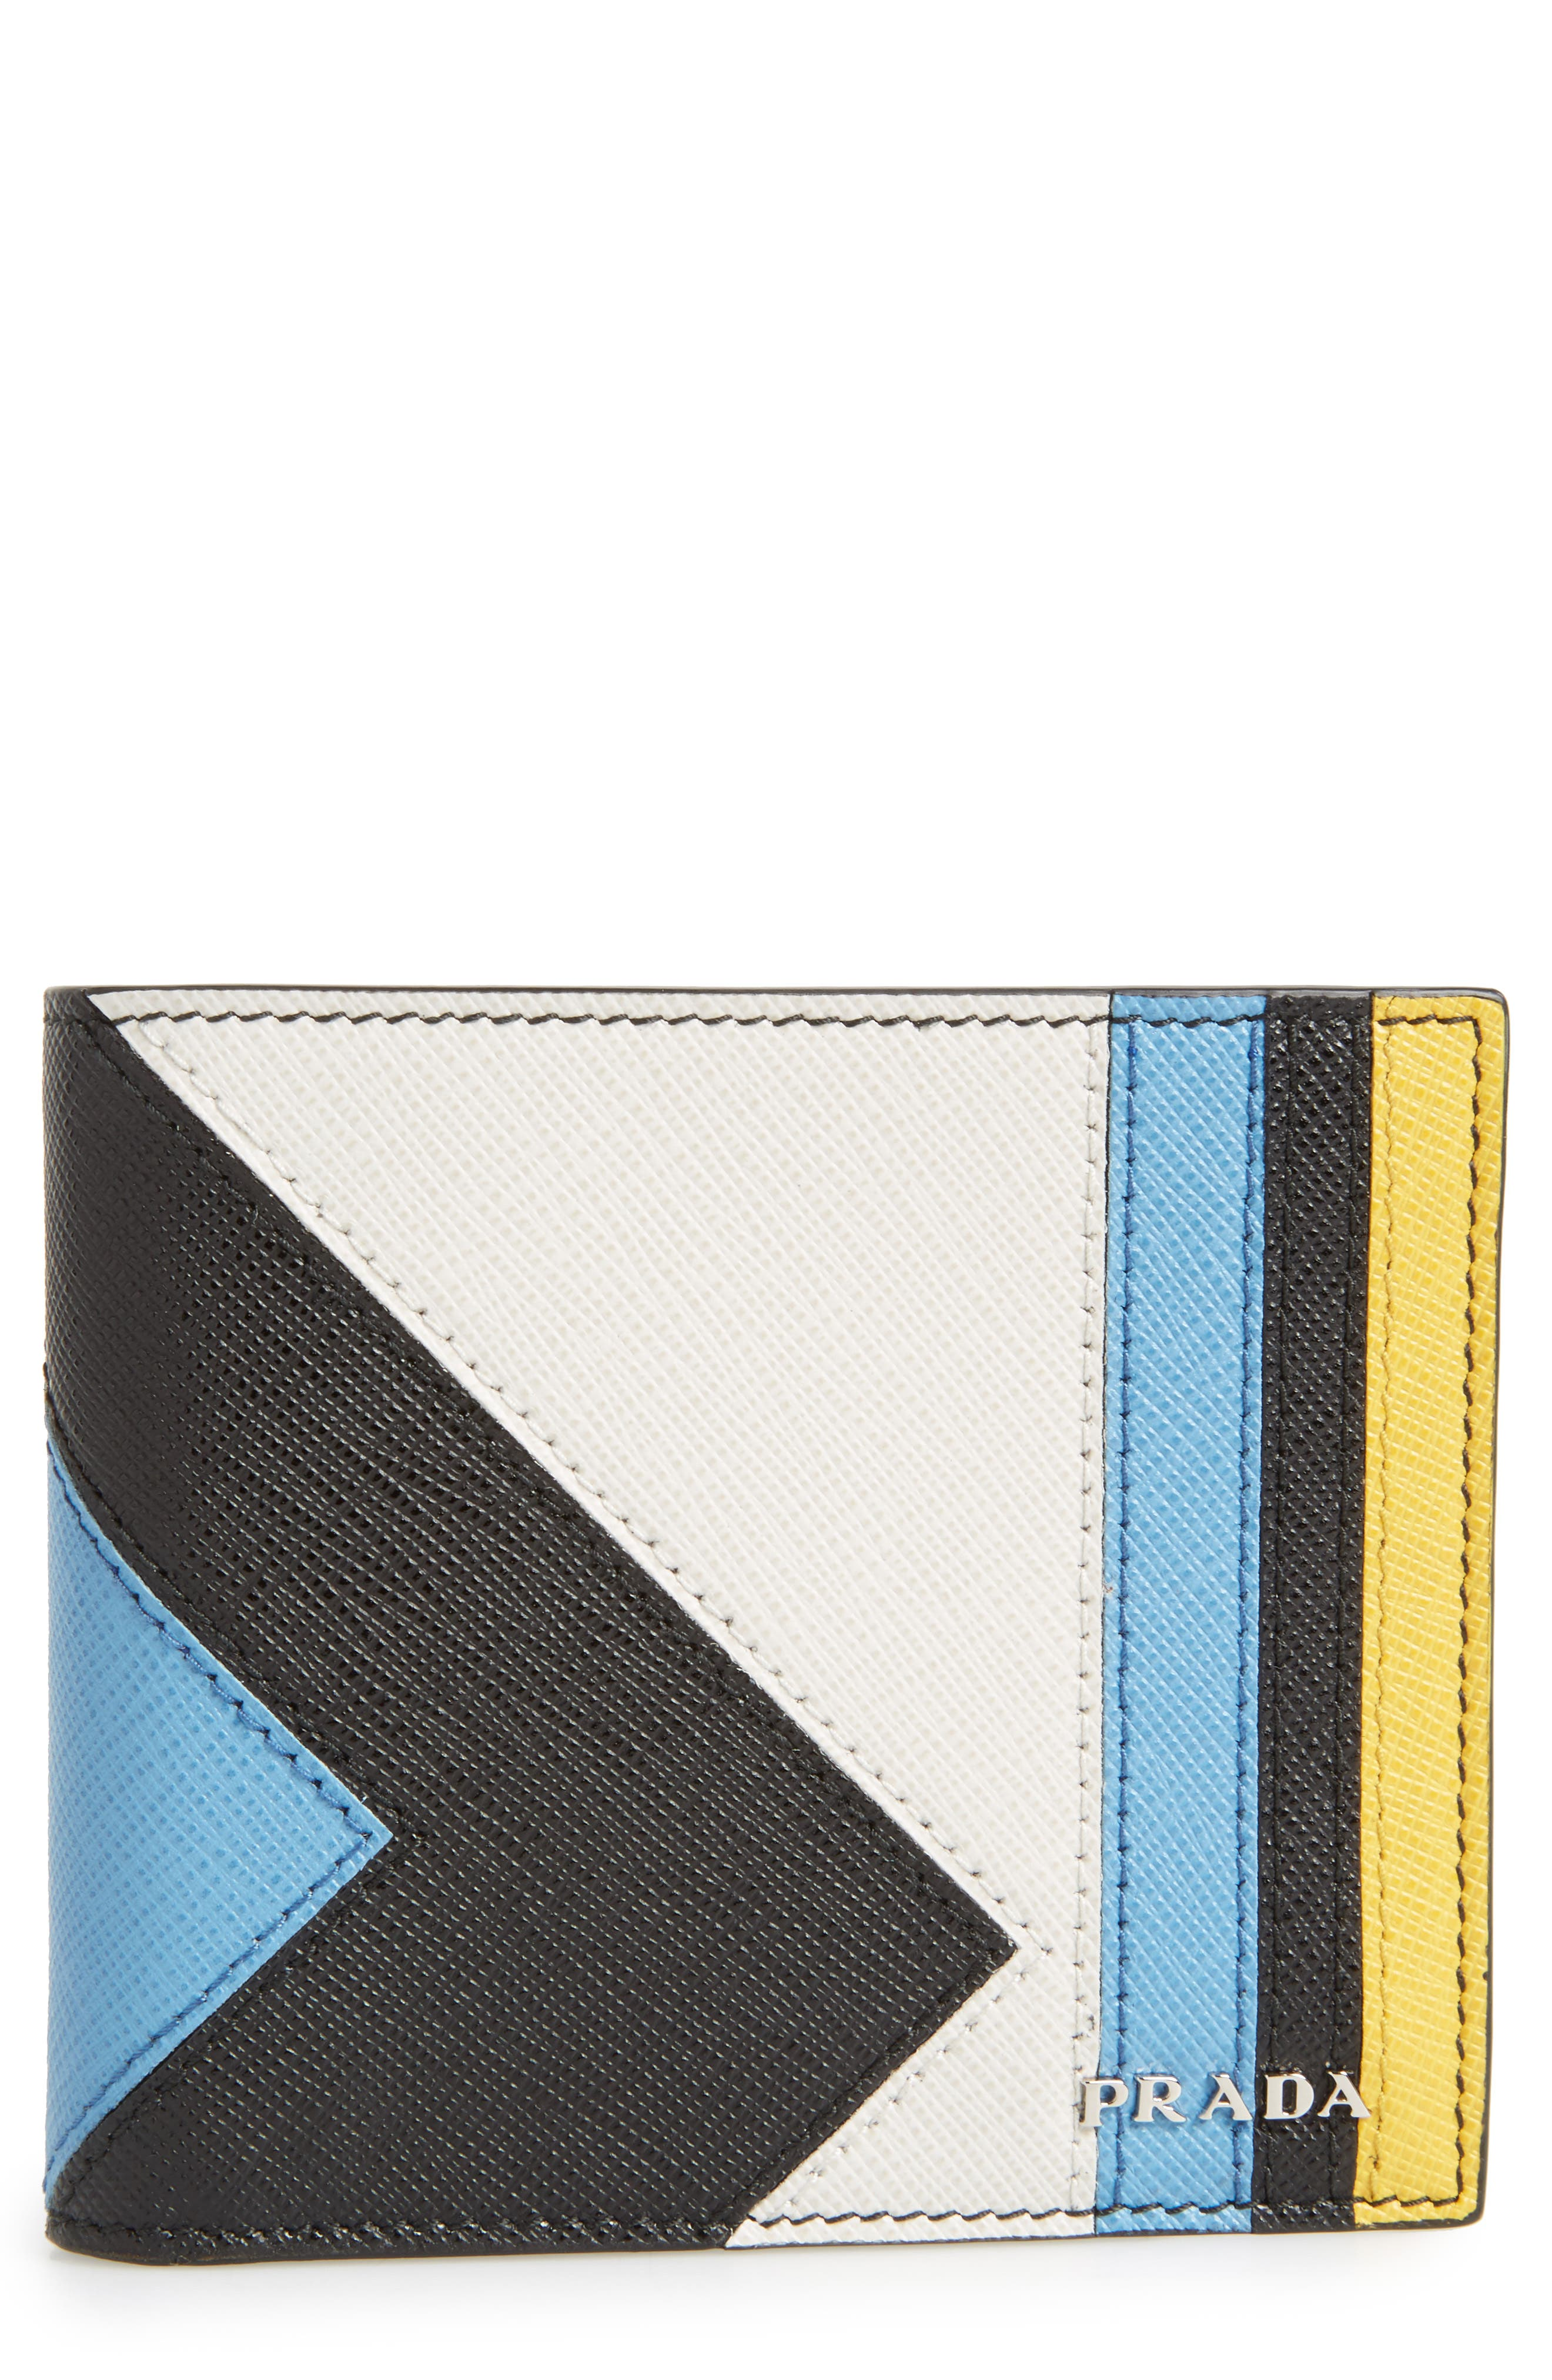 Arrow Calfskin Leather Wallet,                             Main thumbnail 1, color,                             911